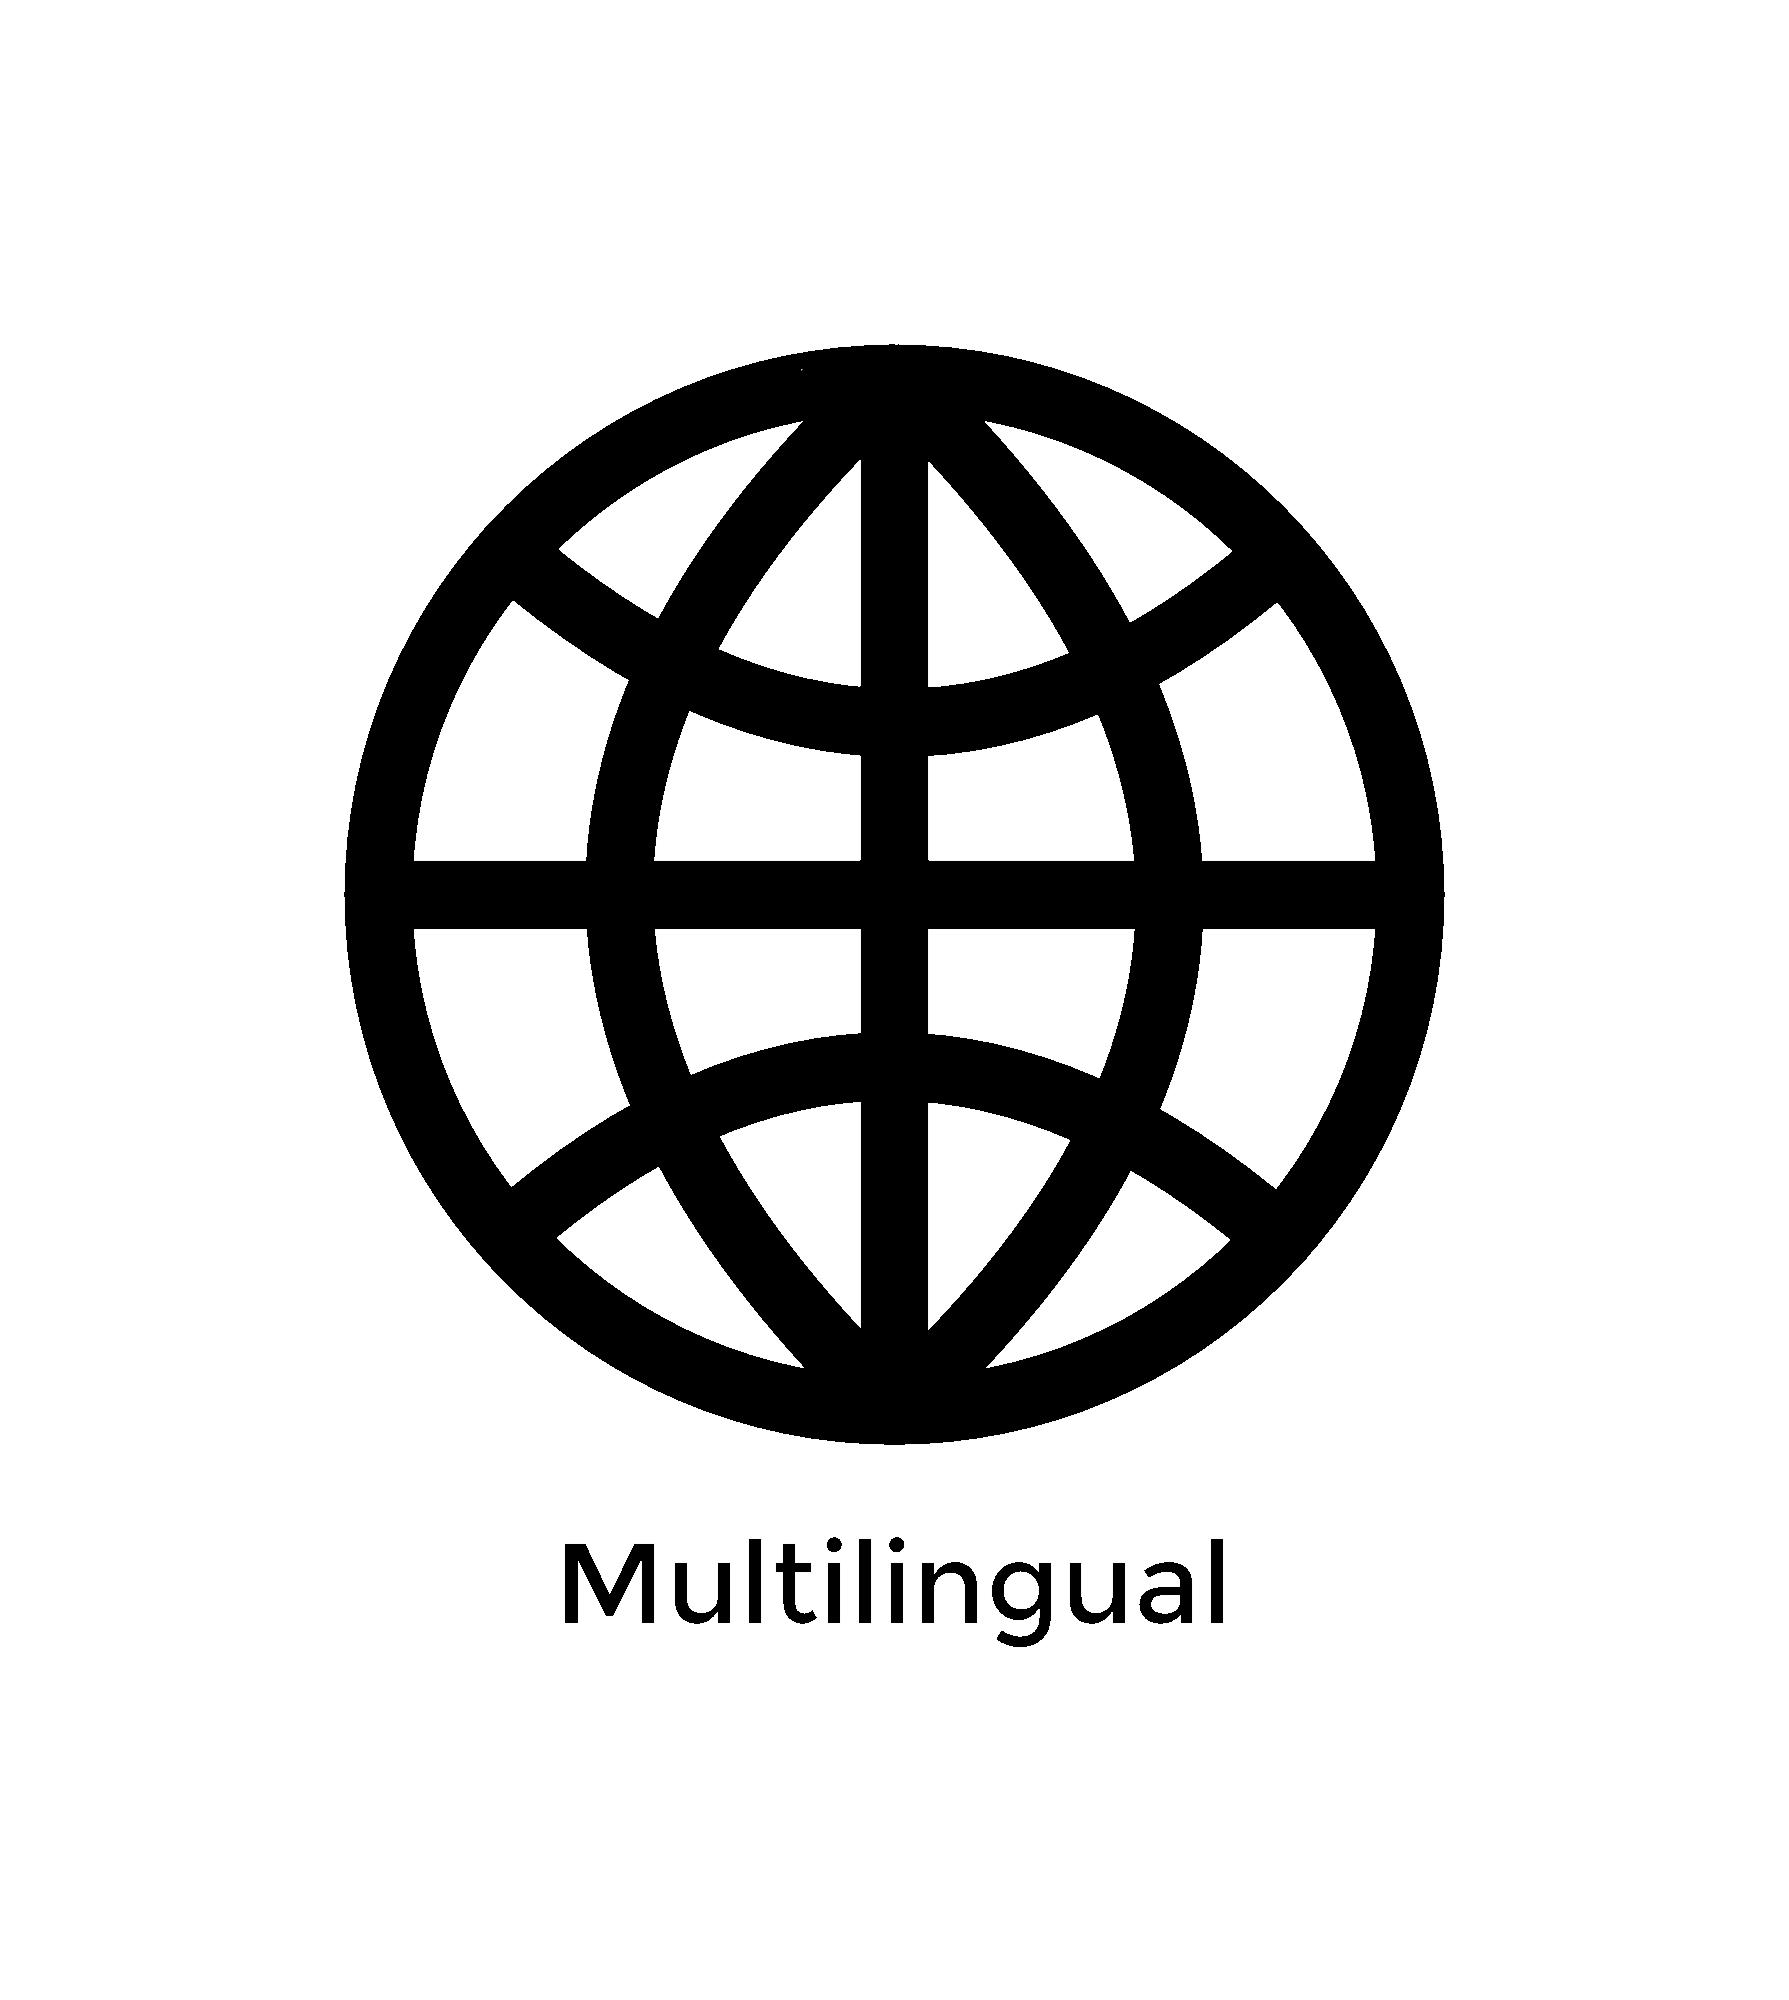 Multilingual-logo Black.png